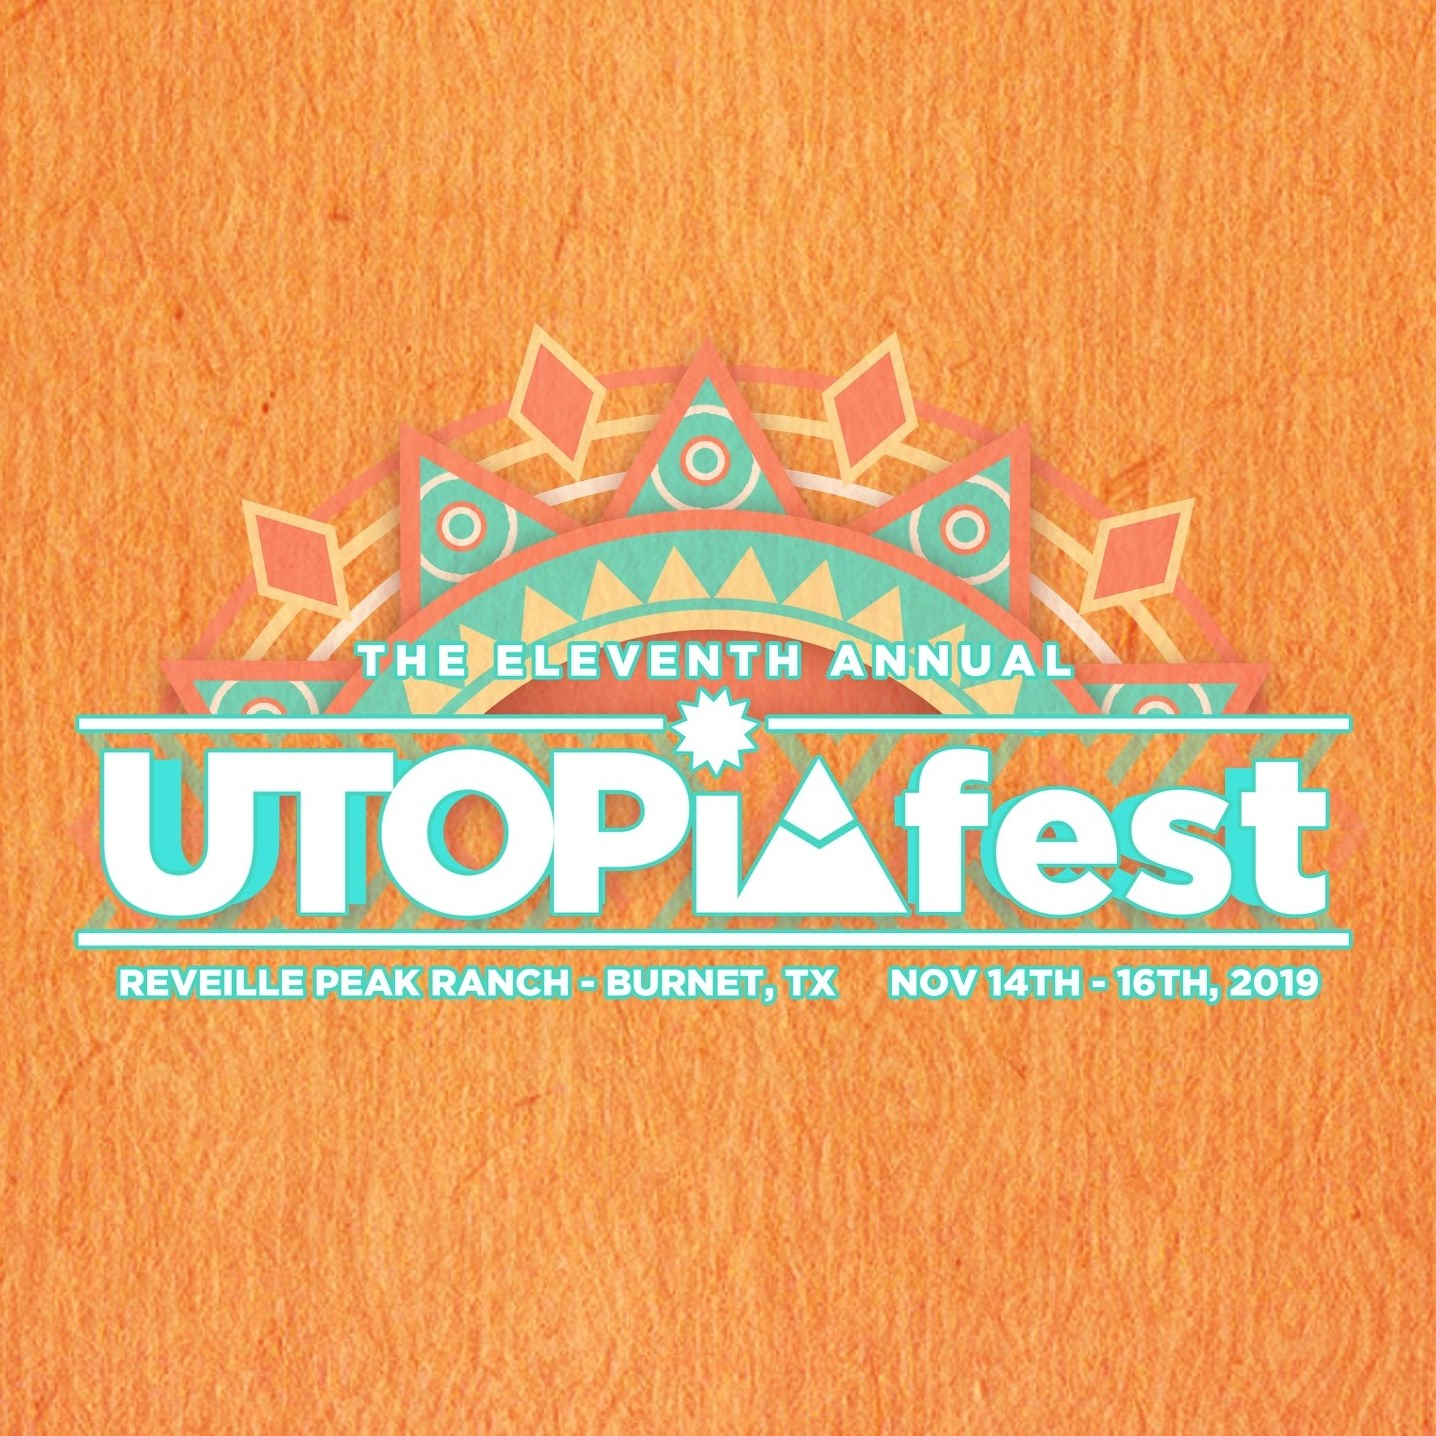 Utopia Fest - Texas Music Festivals 2020